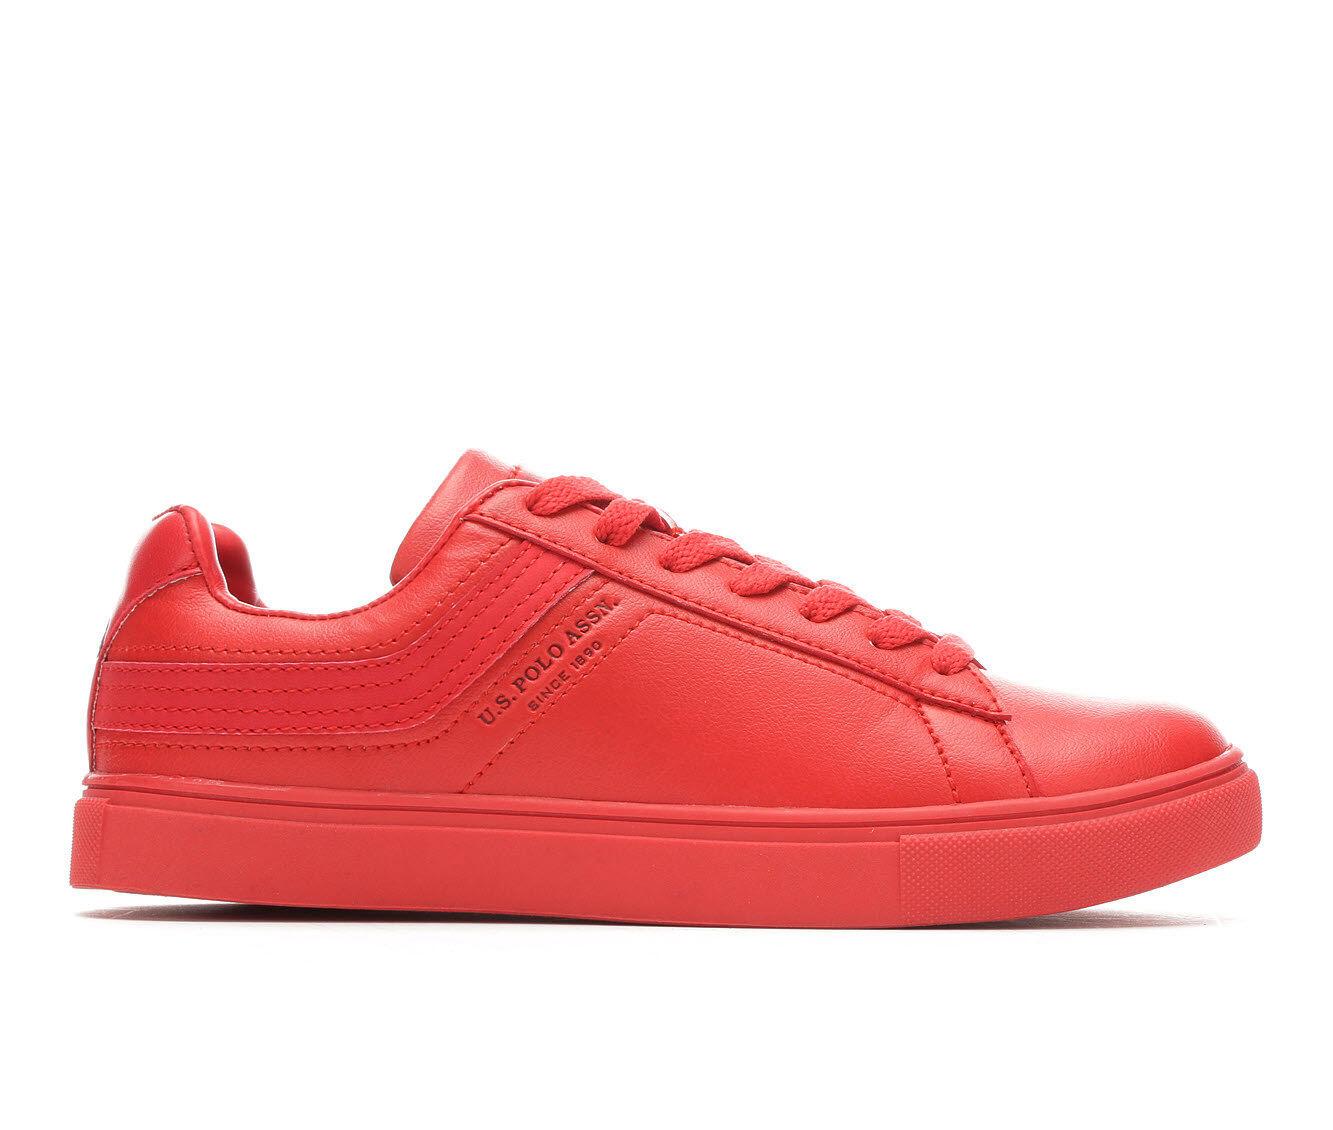 Women's US Polo Assn Julene2 Sneakers sale get authentic aCzQFpTD